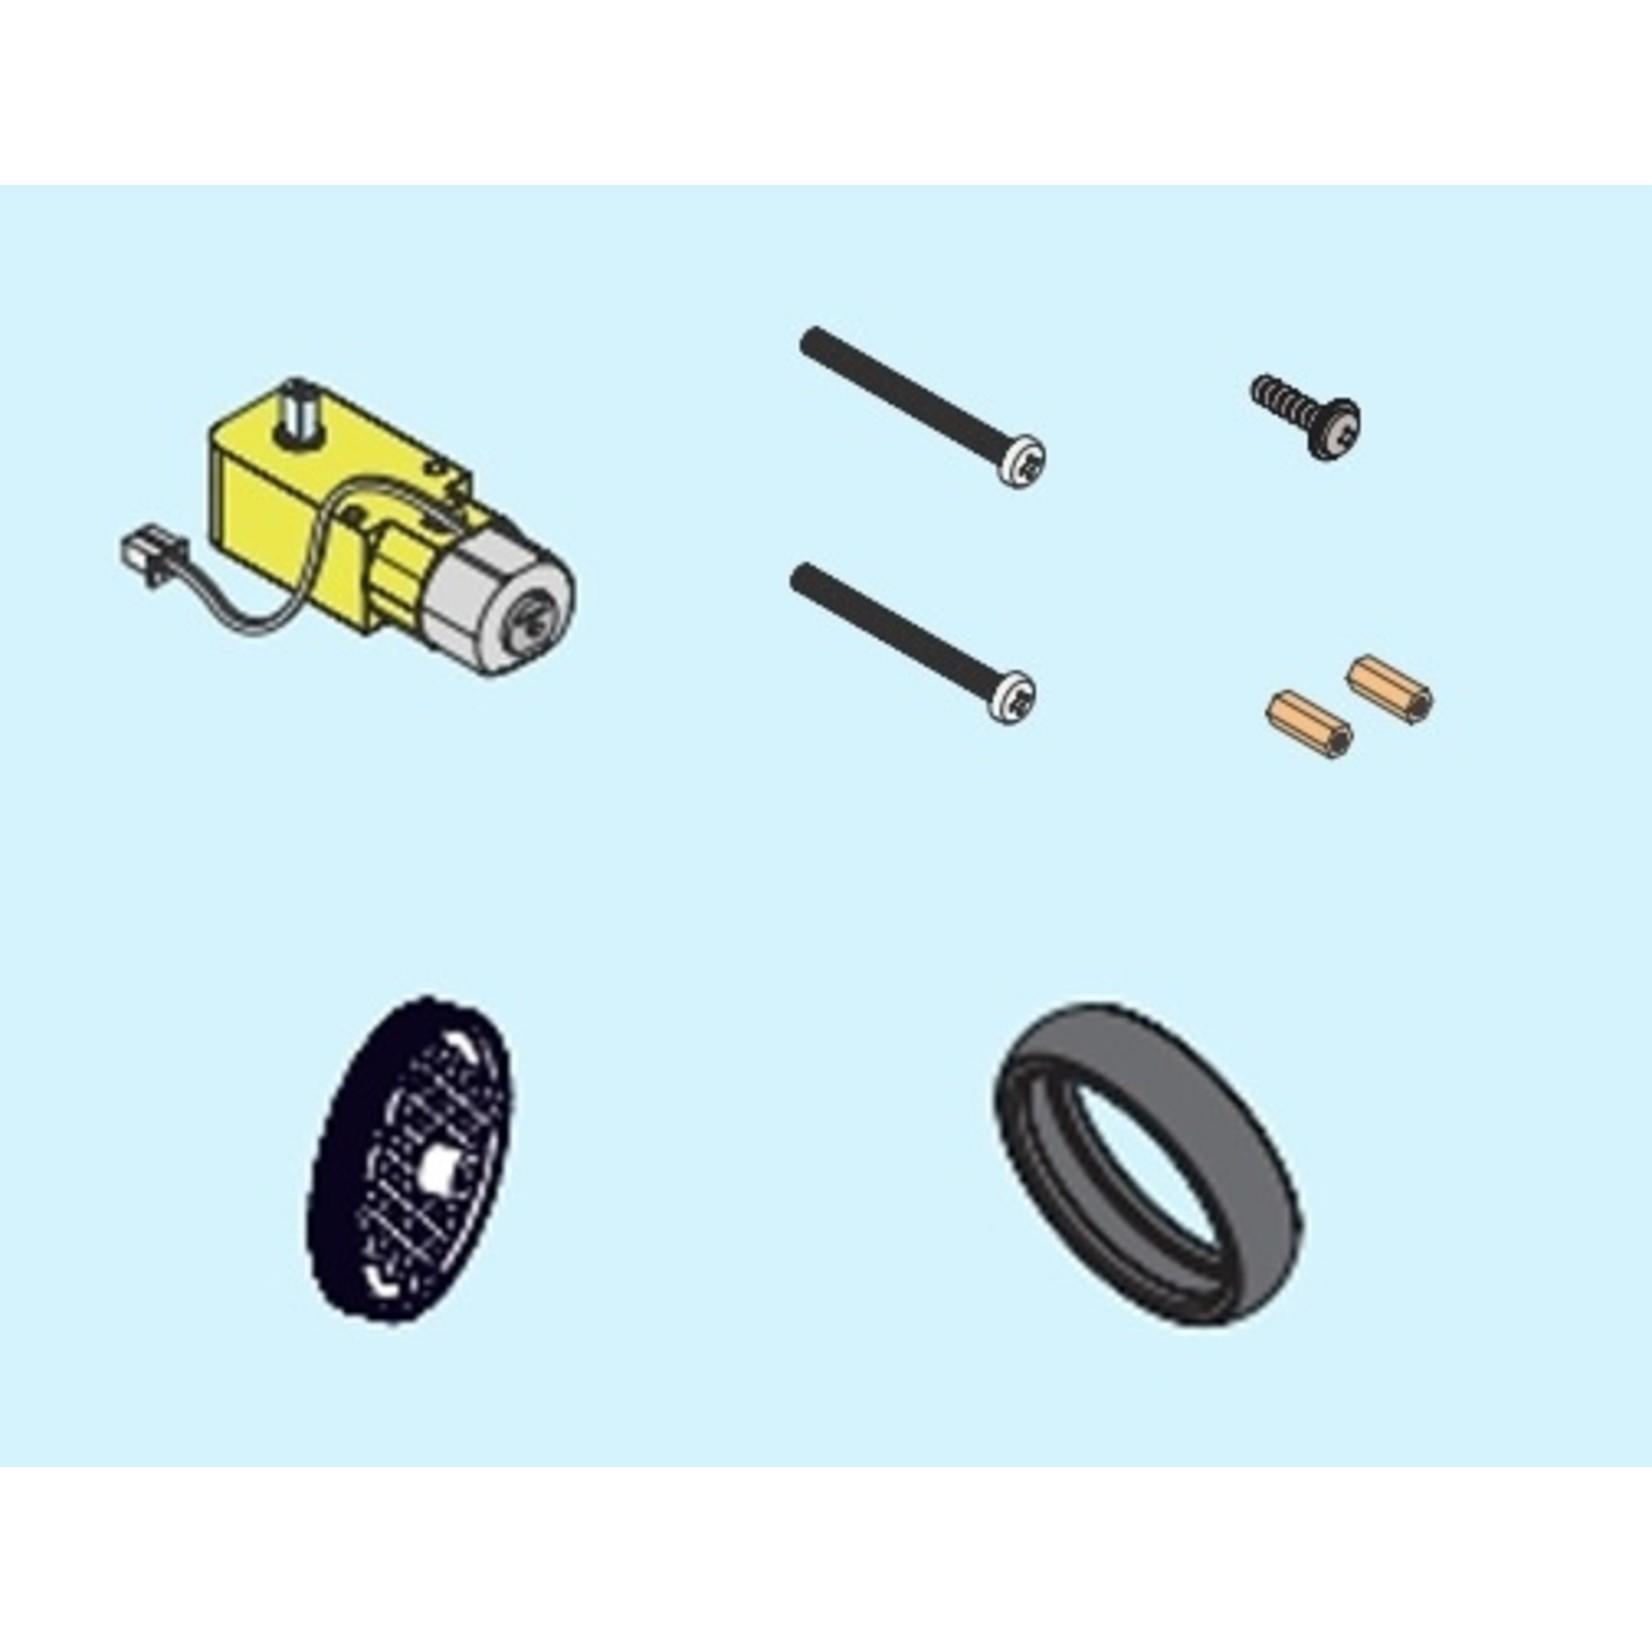 makeblock mBuild Double-Shaft Motor Package